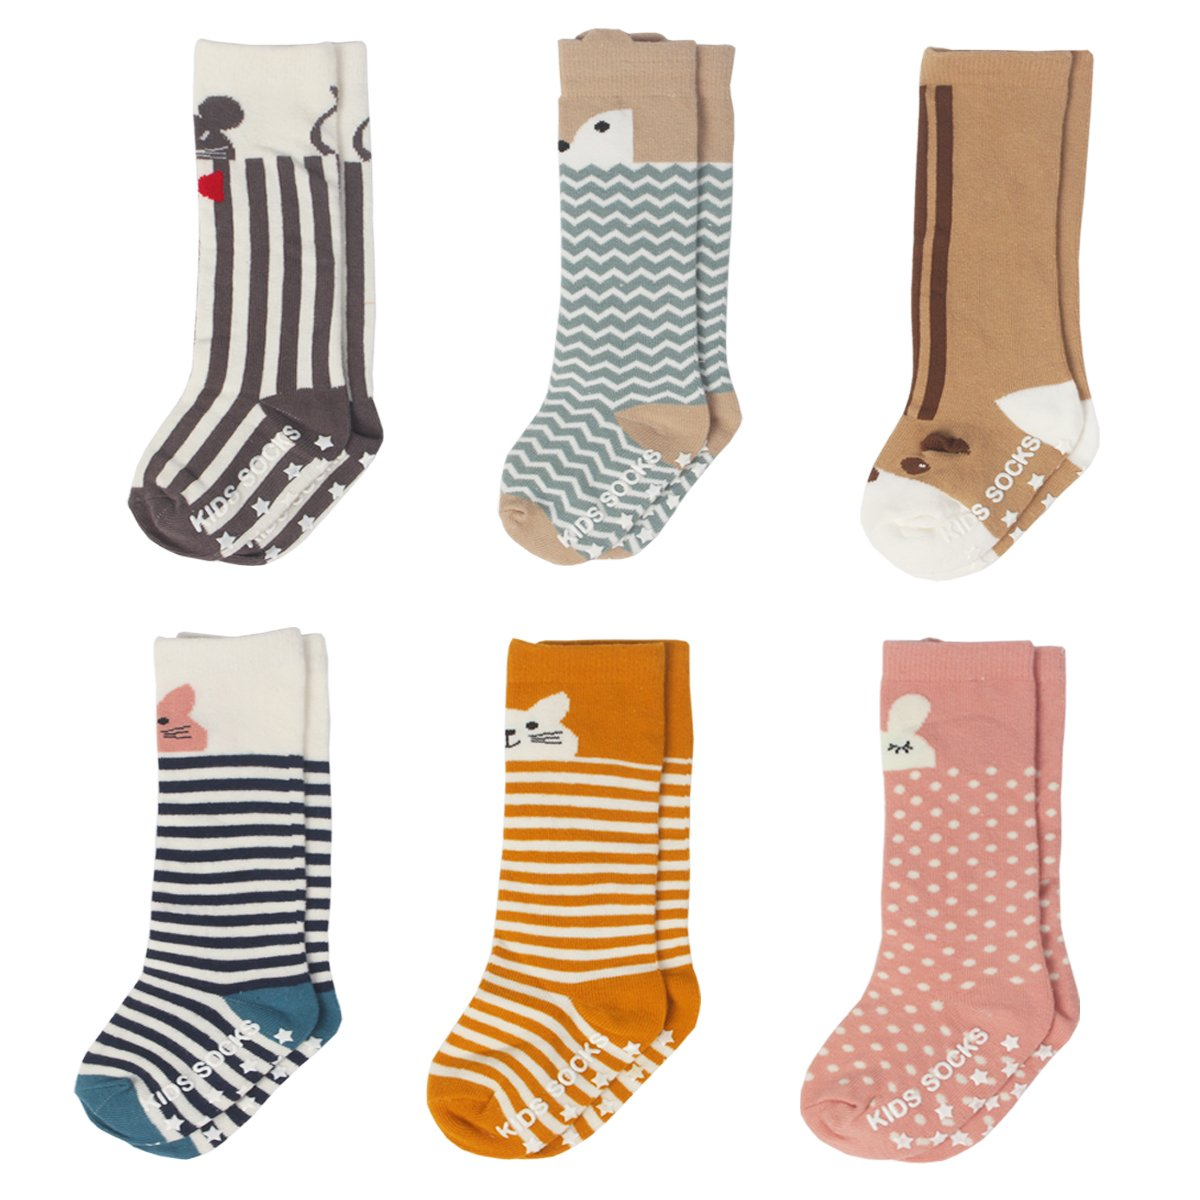 IMISNO Toddler Socks Non Skid Cotton Stockings Animal Theme Knee High Socks For Unisex-Baby Boys&Girls Leg warmmers 6-Pairs (S (0-2years))